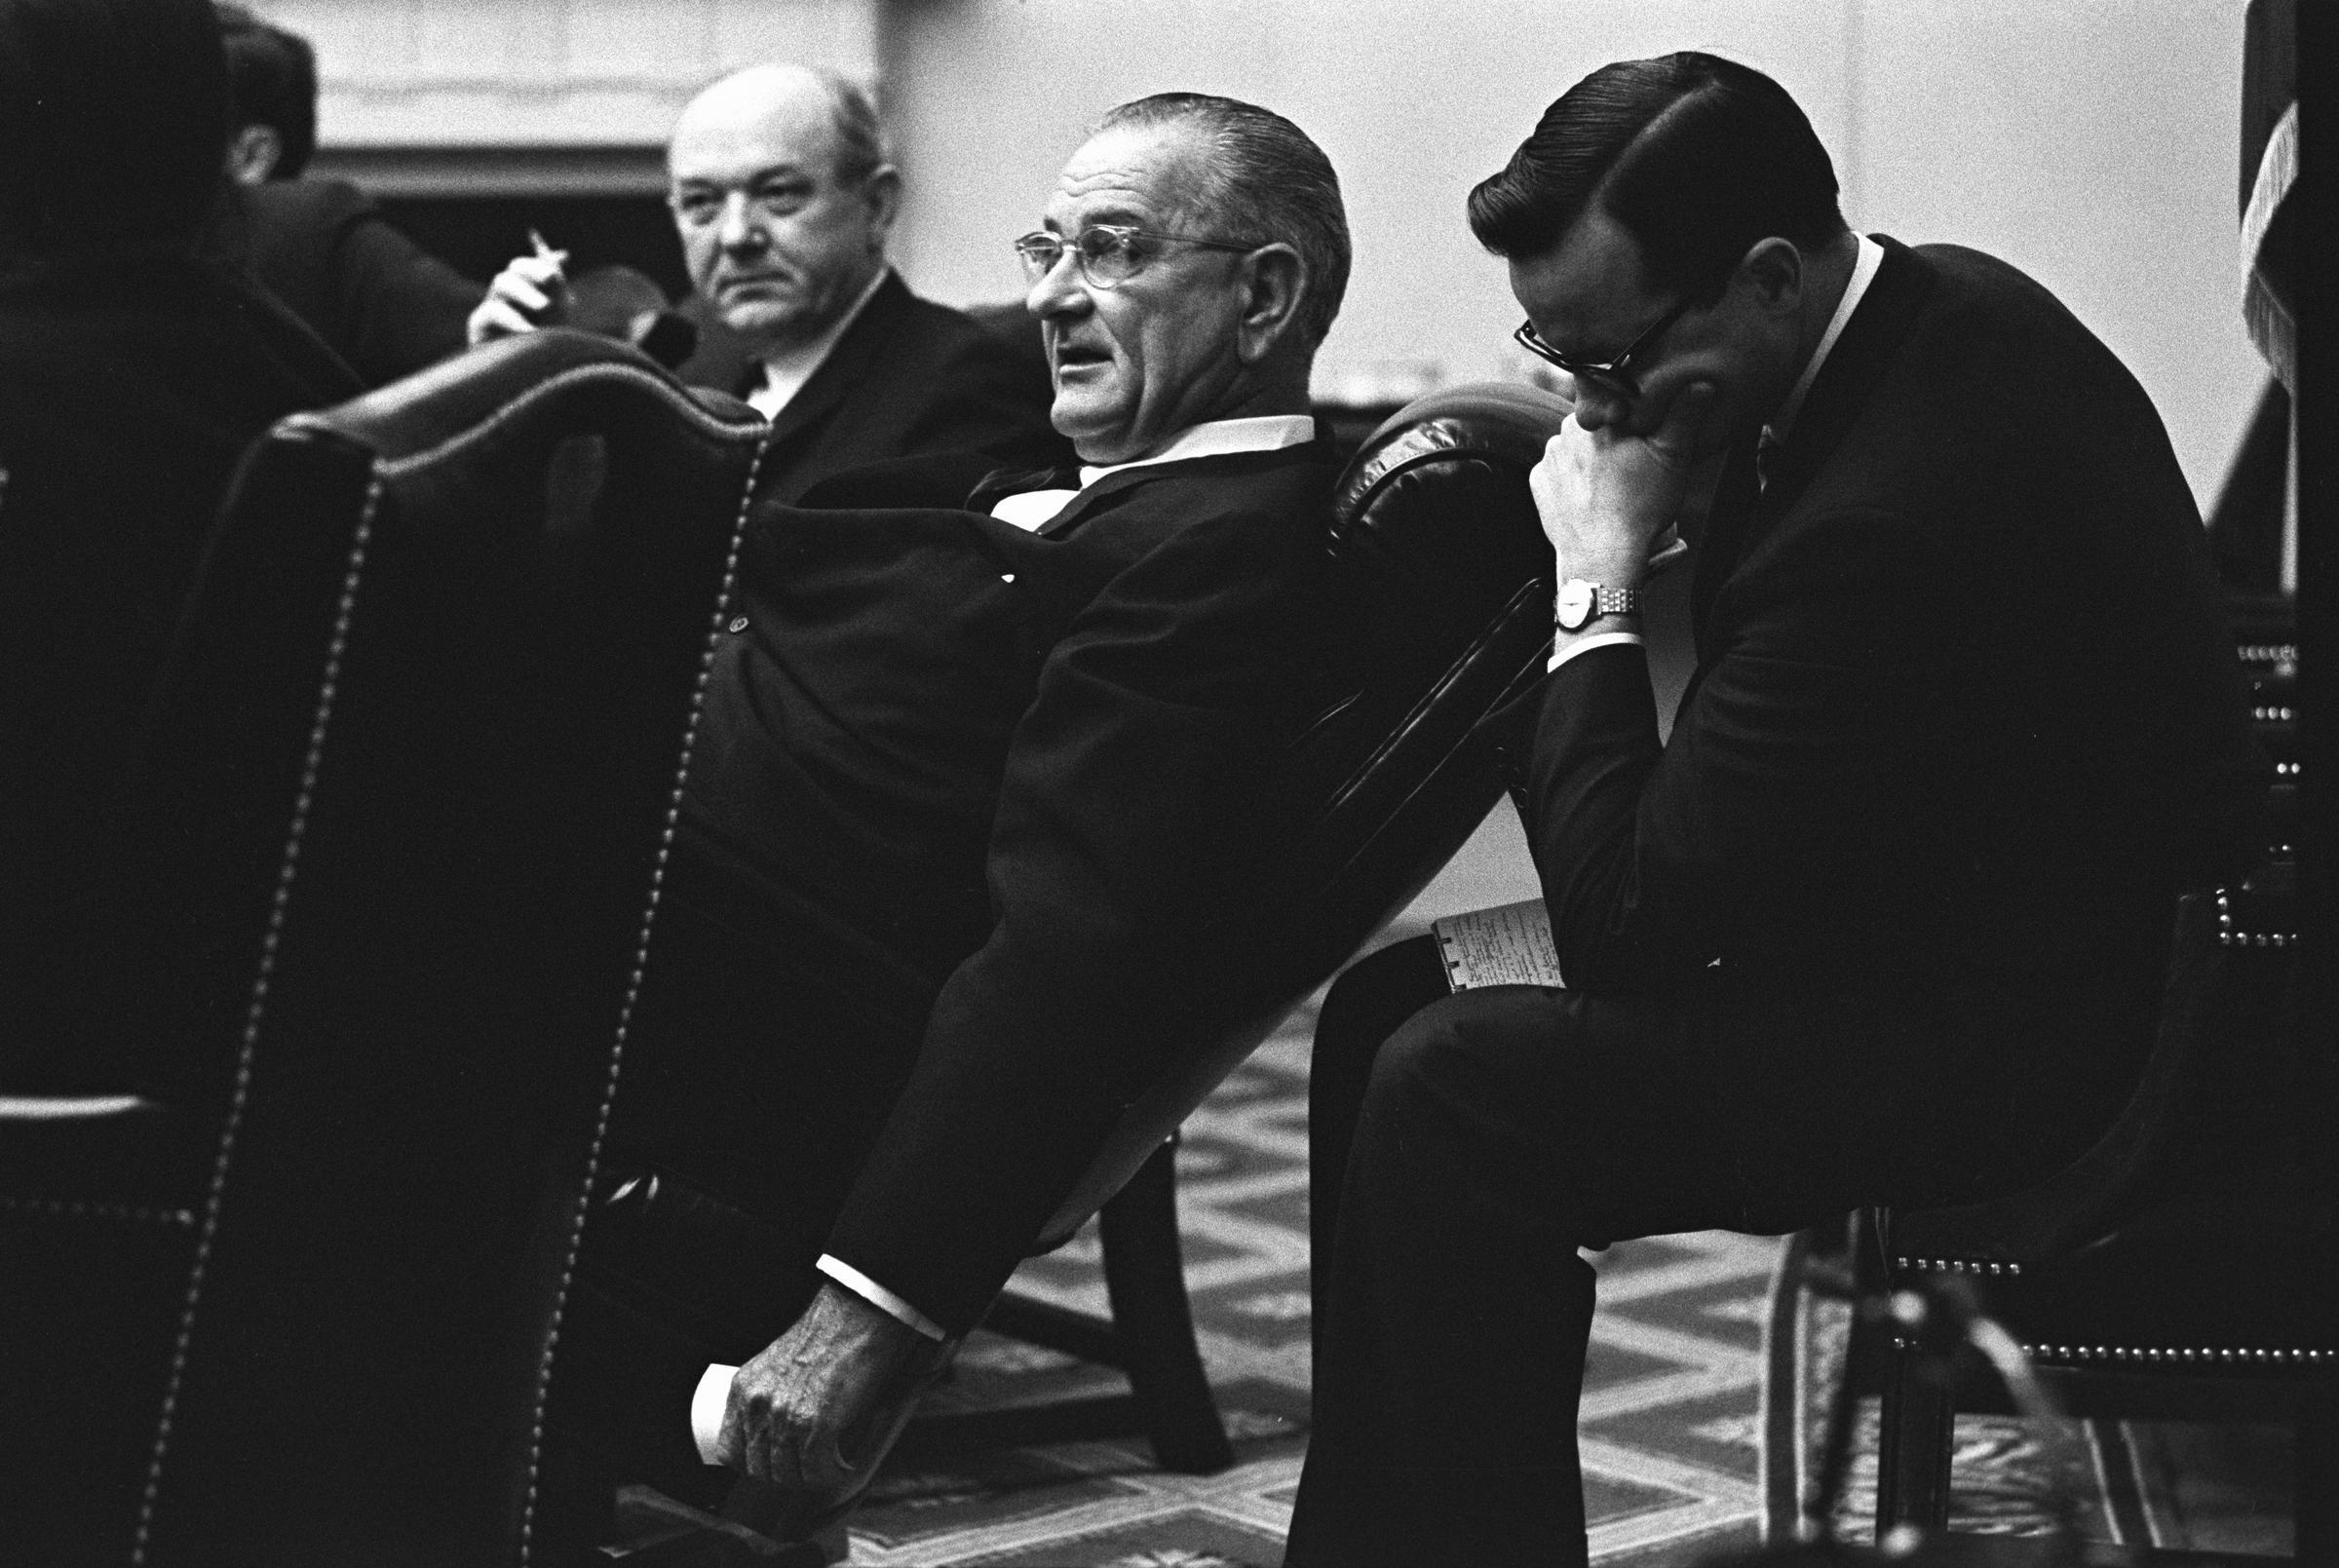 vietnam as lyndon johnson Speech on vietnam (1965) lyndon b johnson [what president kennedy pledged generally is his inaugural address in 1961, his successor president johnson applies directly to vietnam in 1965.